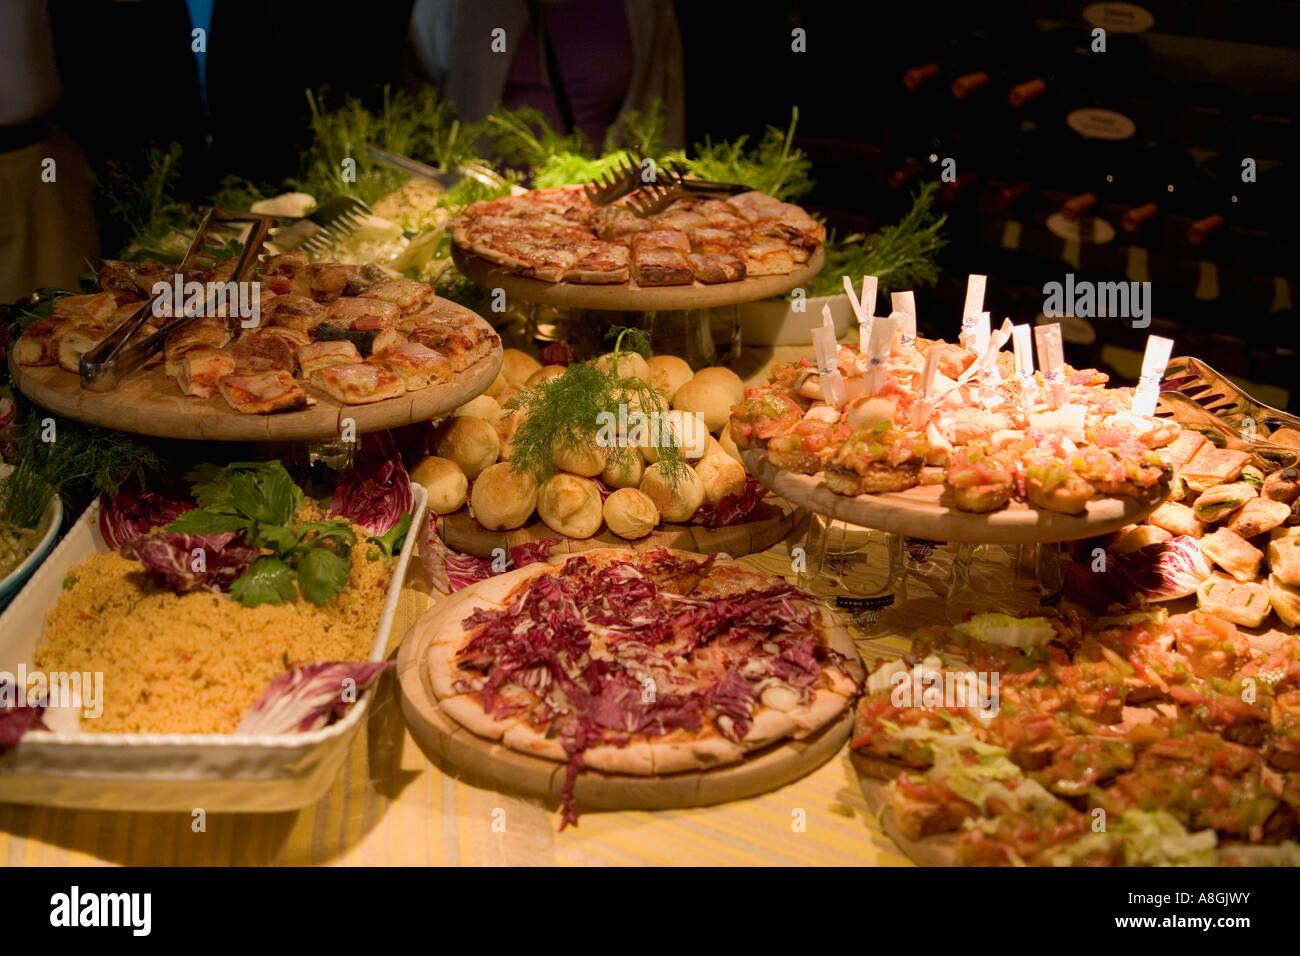 Antipasti plates of pizza and bruschetta at bar Palermo Sicily Italy - Stock Image